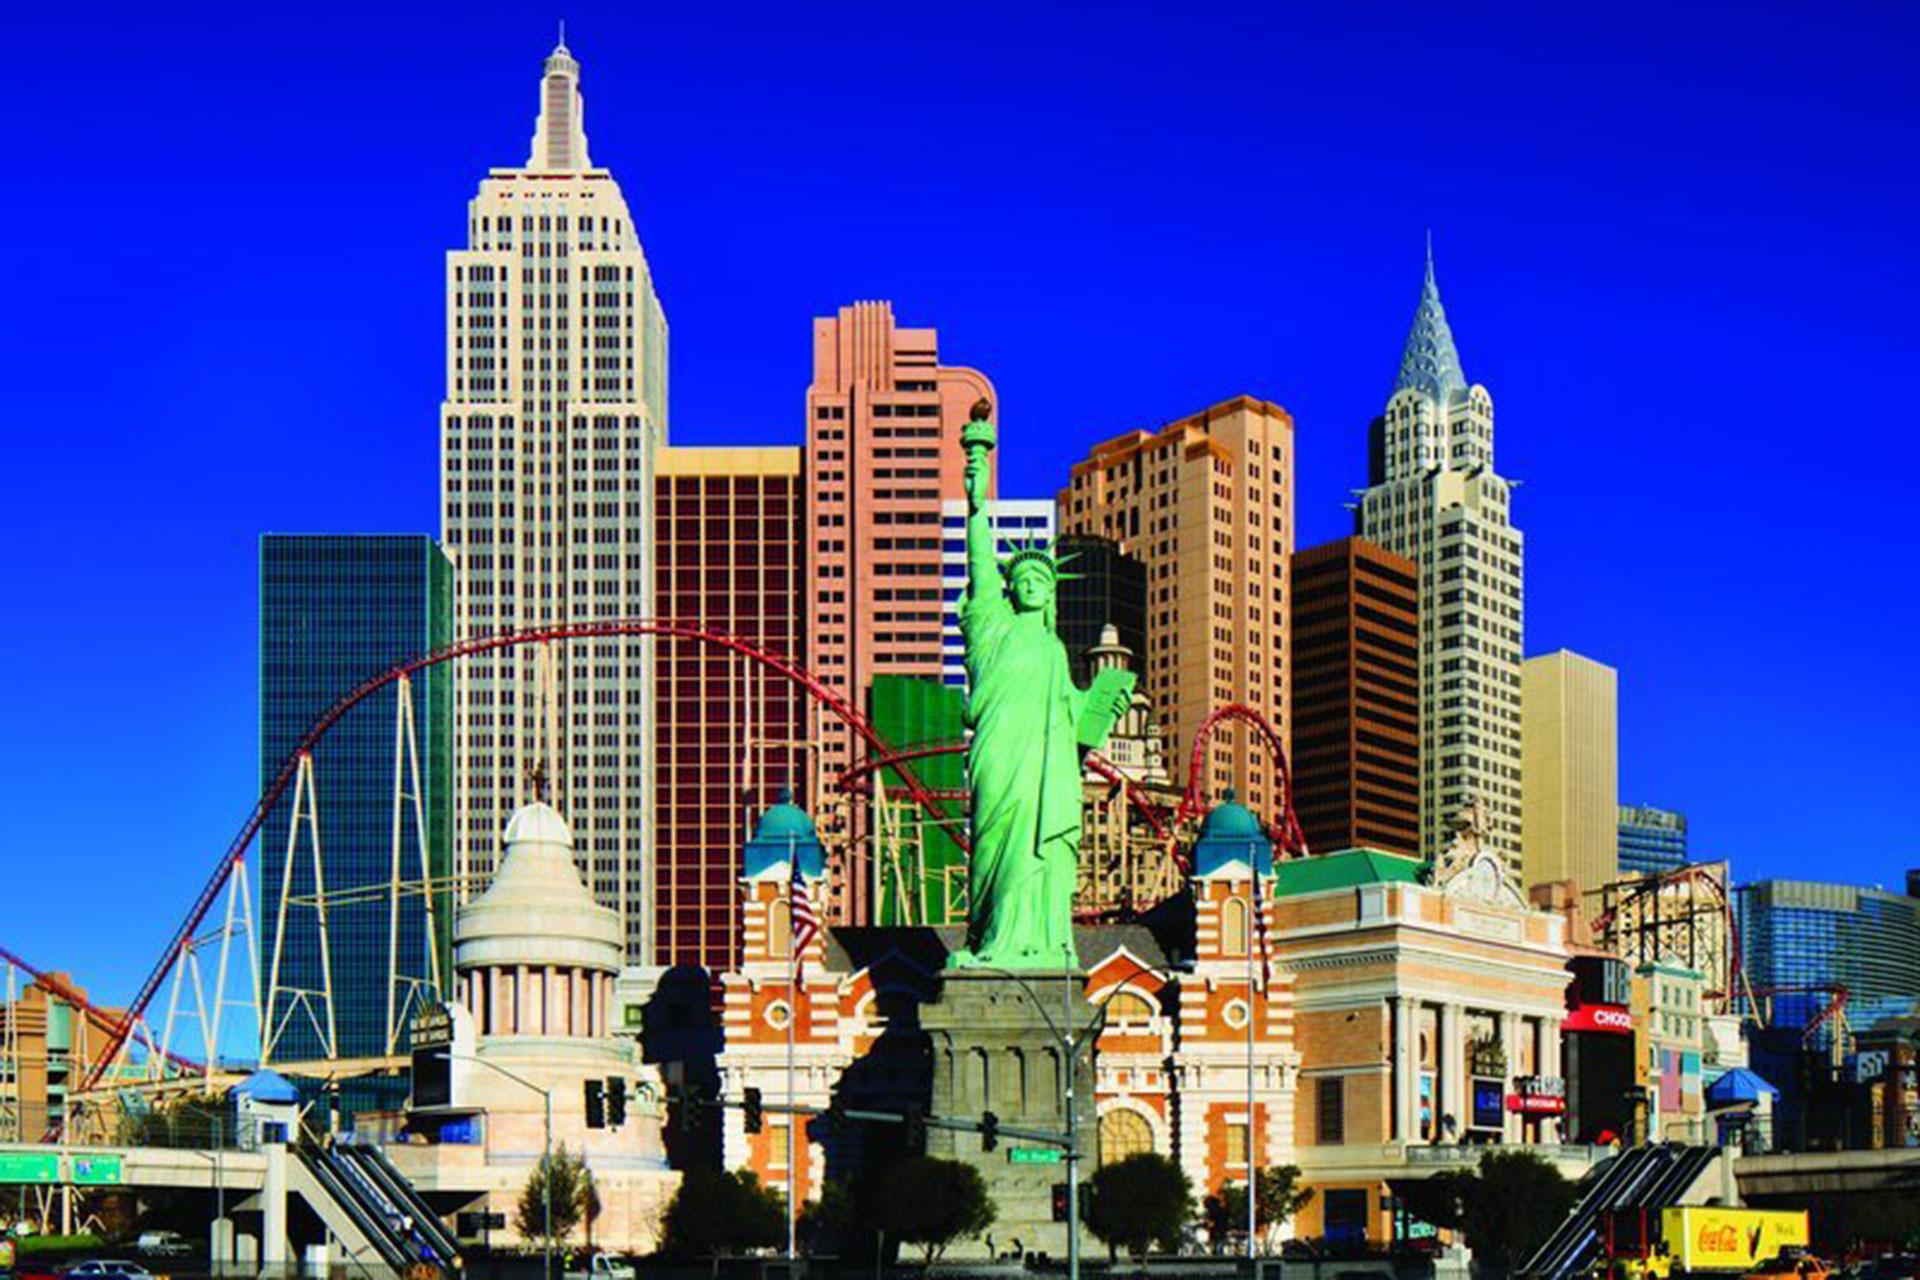 Exterior of New York-New York Hotel and Casino in Las Vegas